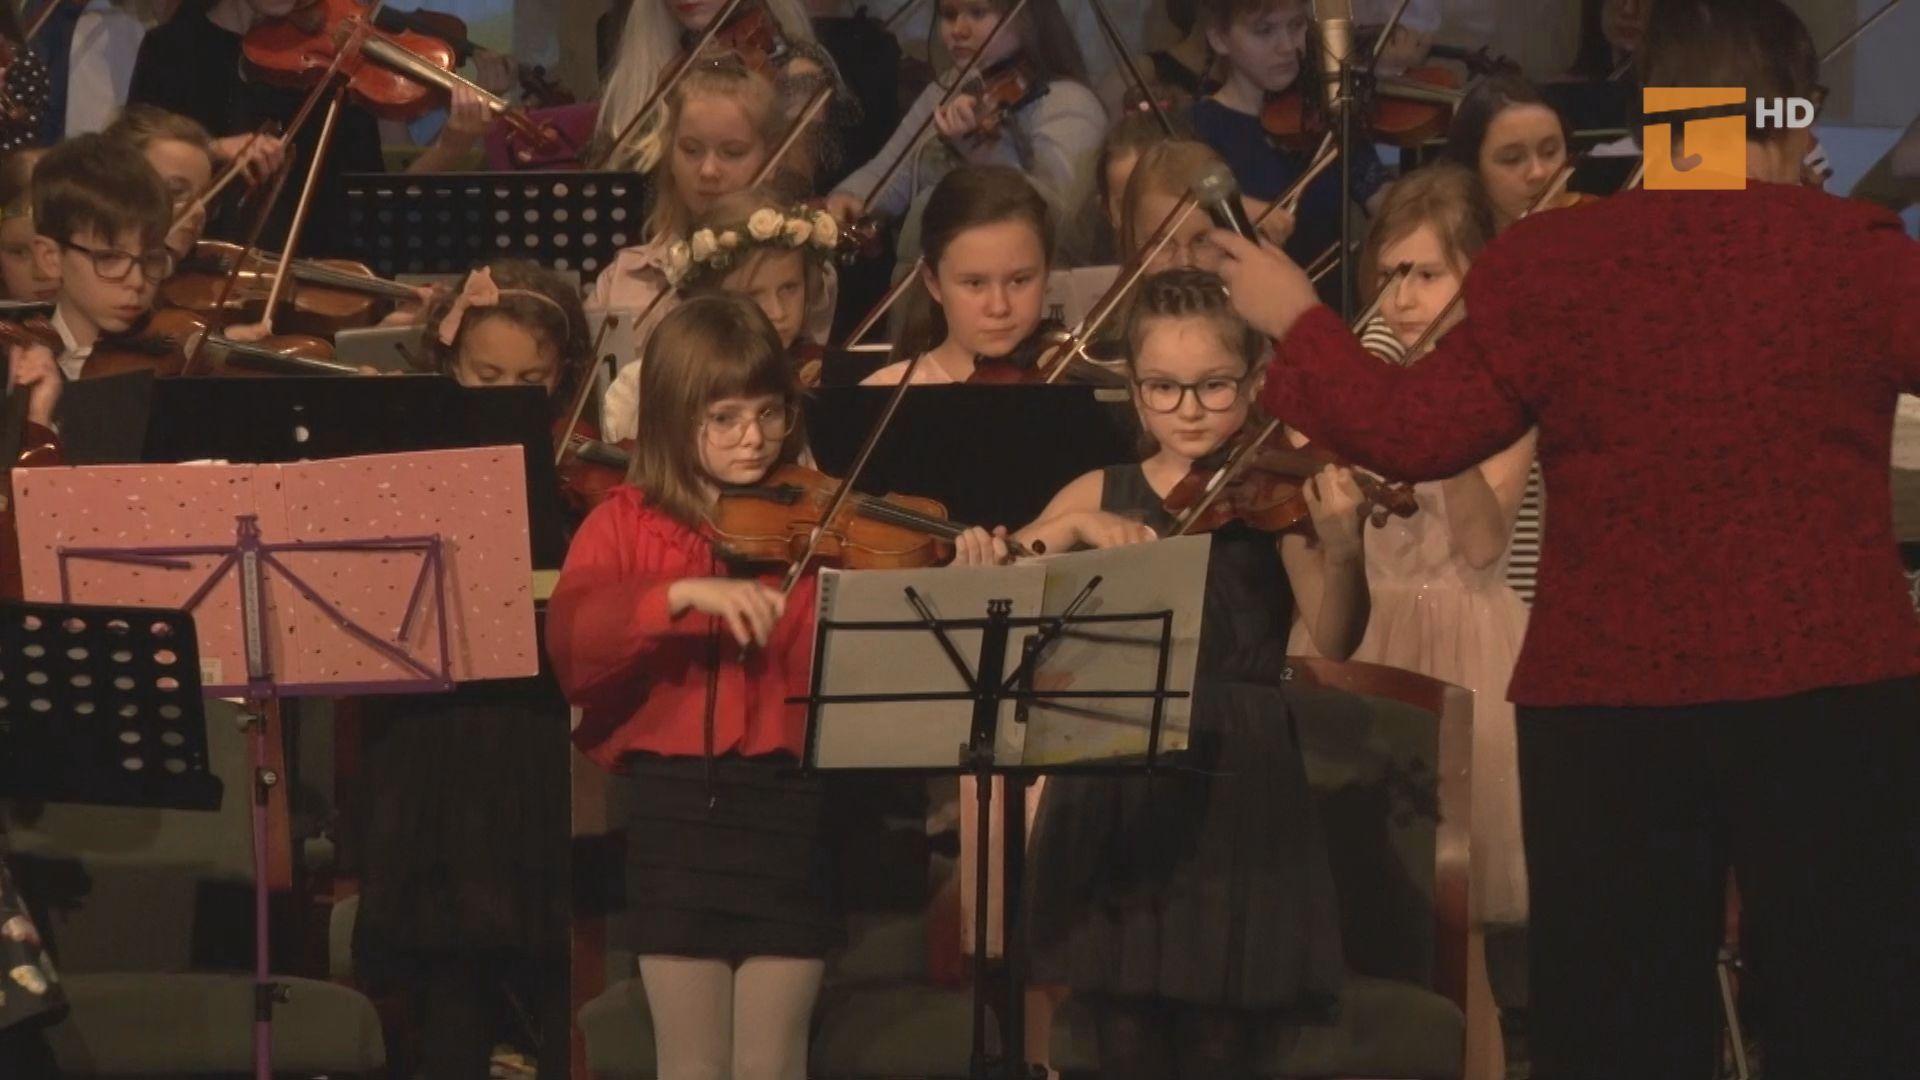 koncert skrzypcowy